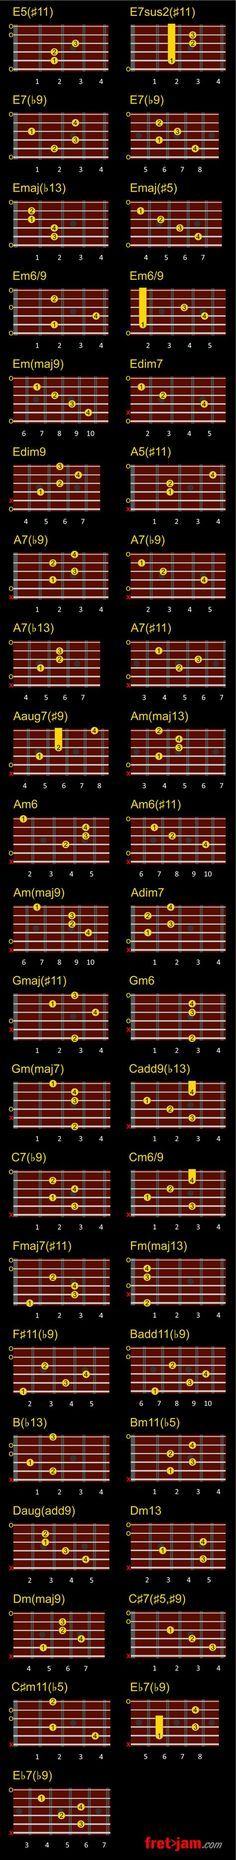 dark guitar chord chart | Music | Pinterest | Guitar chord chart ...